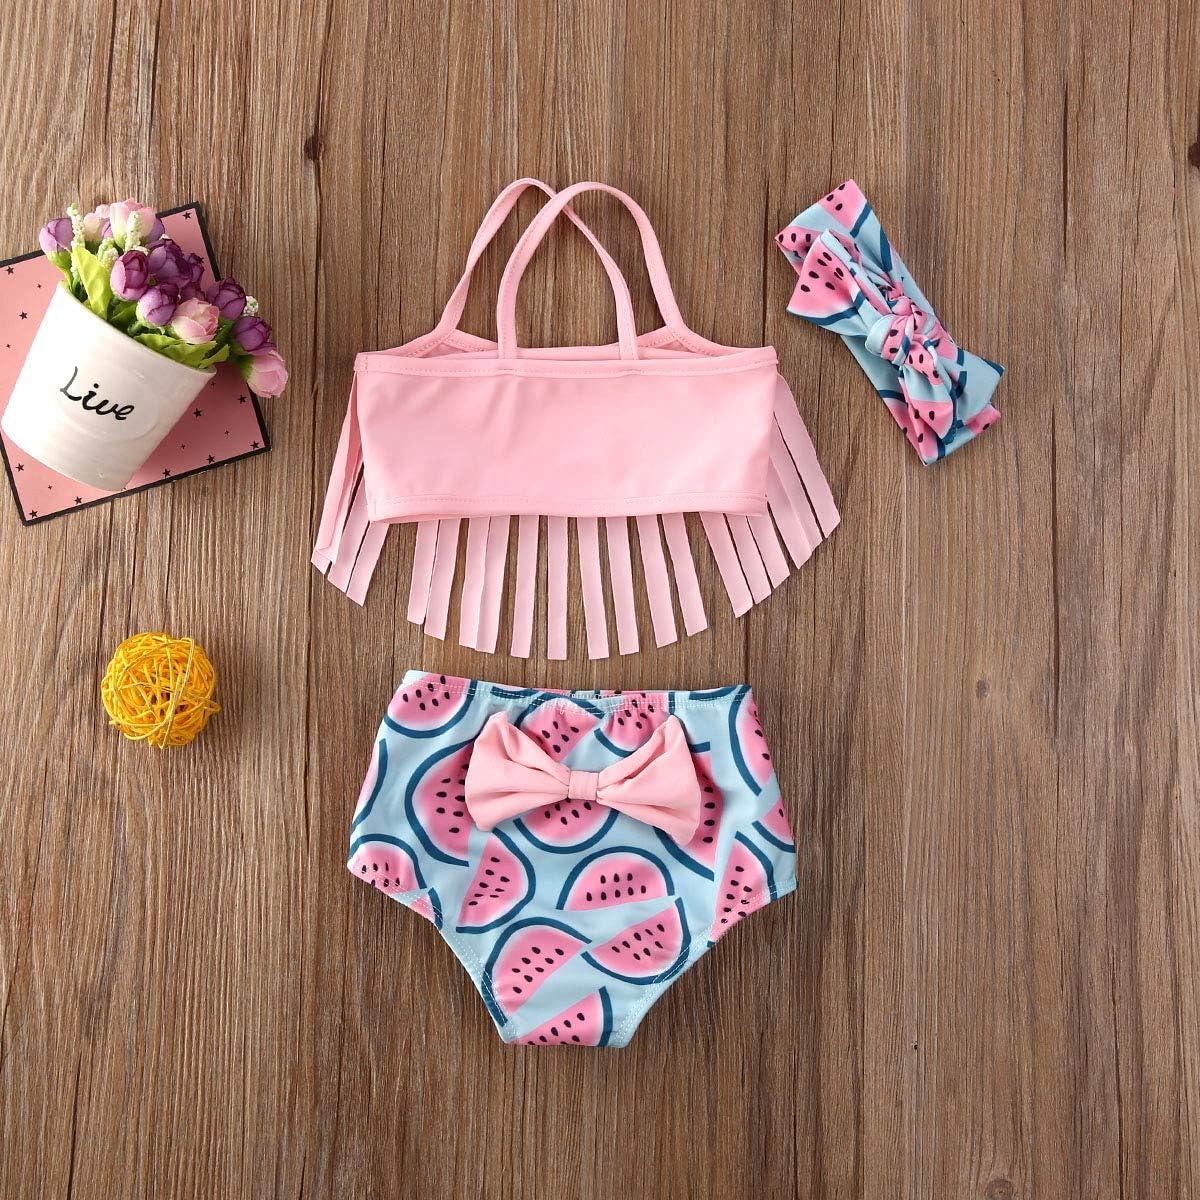 3PCS Toddler Baby Girl Bikini Set Tassel Top Pineapple//Watermelon Printed High Waist Bottoms Swimwear Bathing Suit